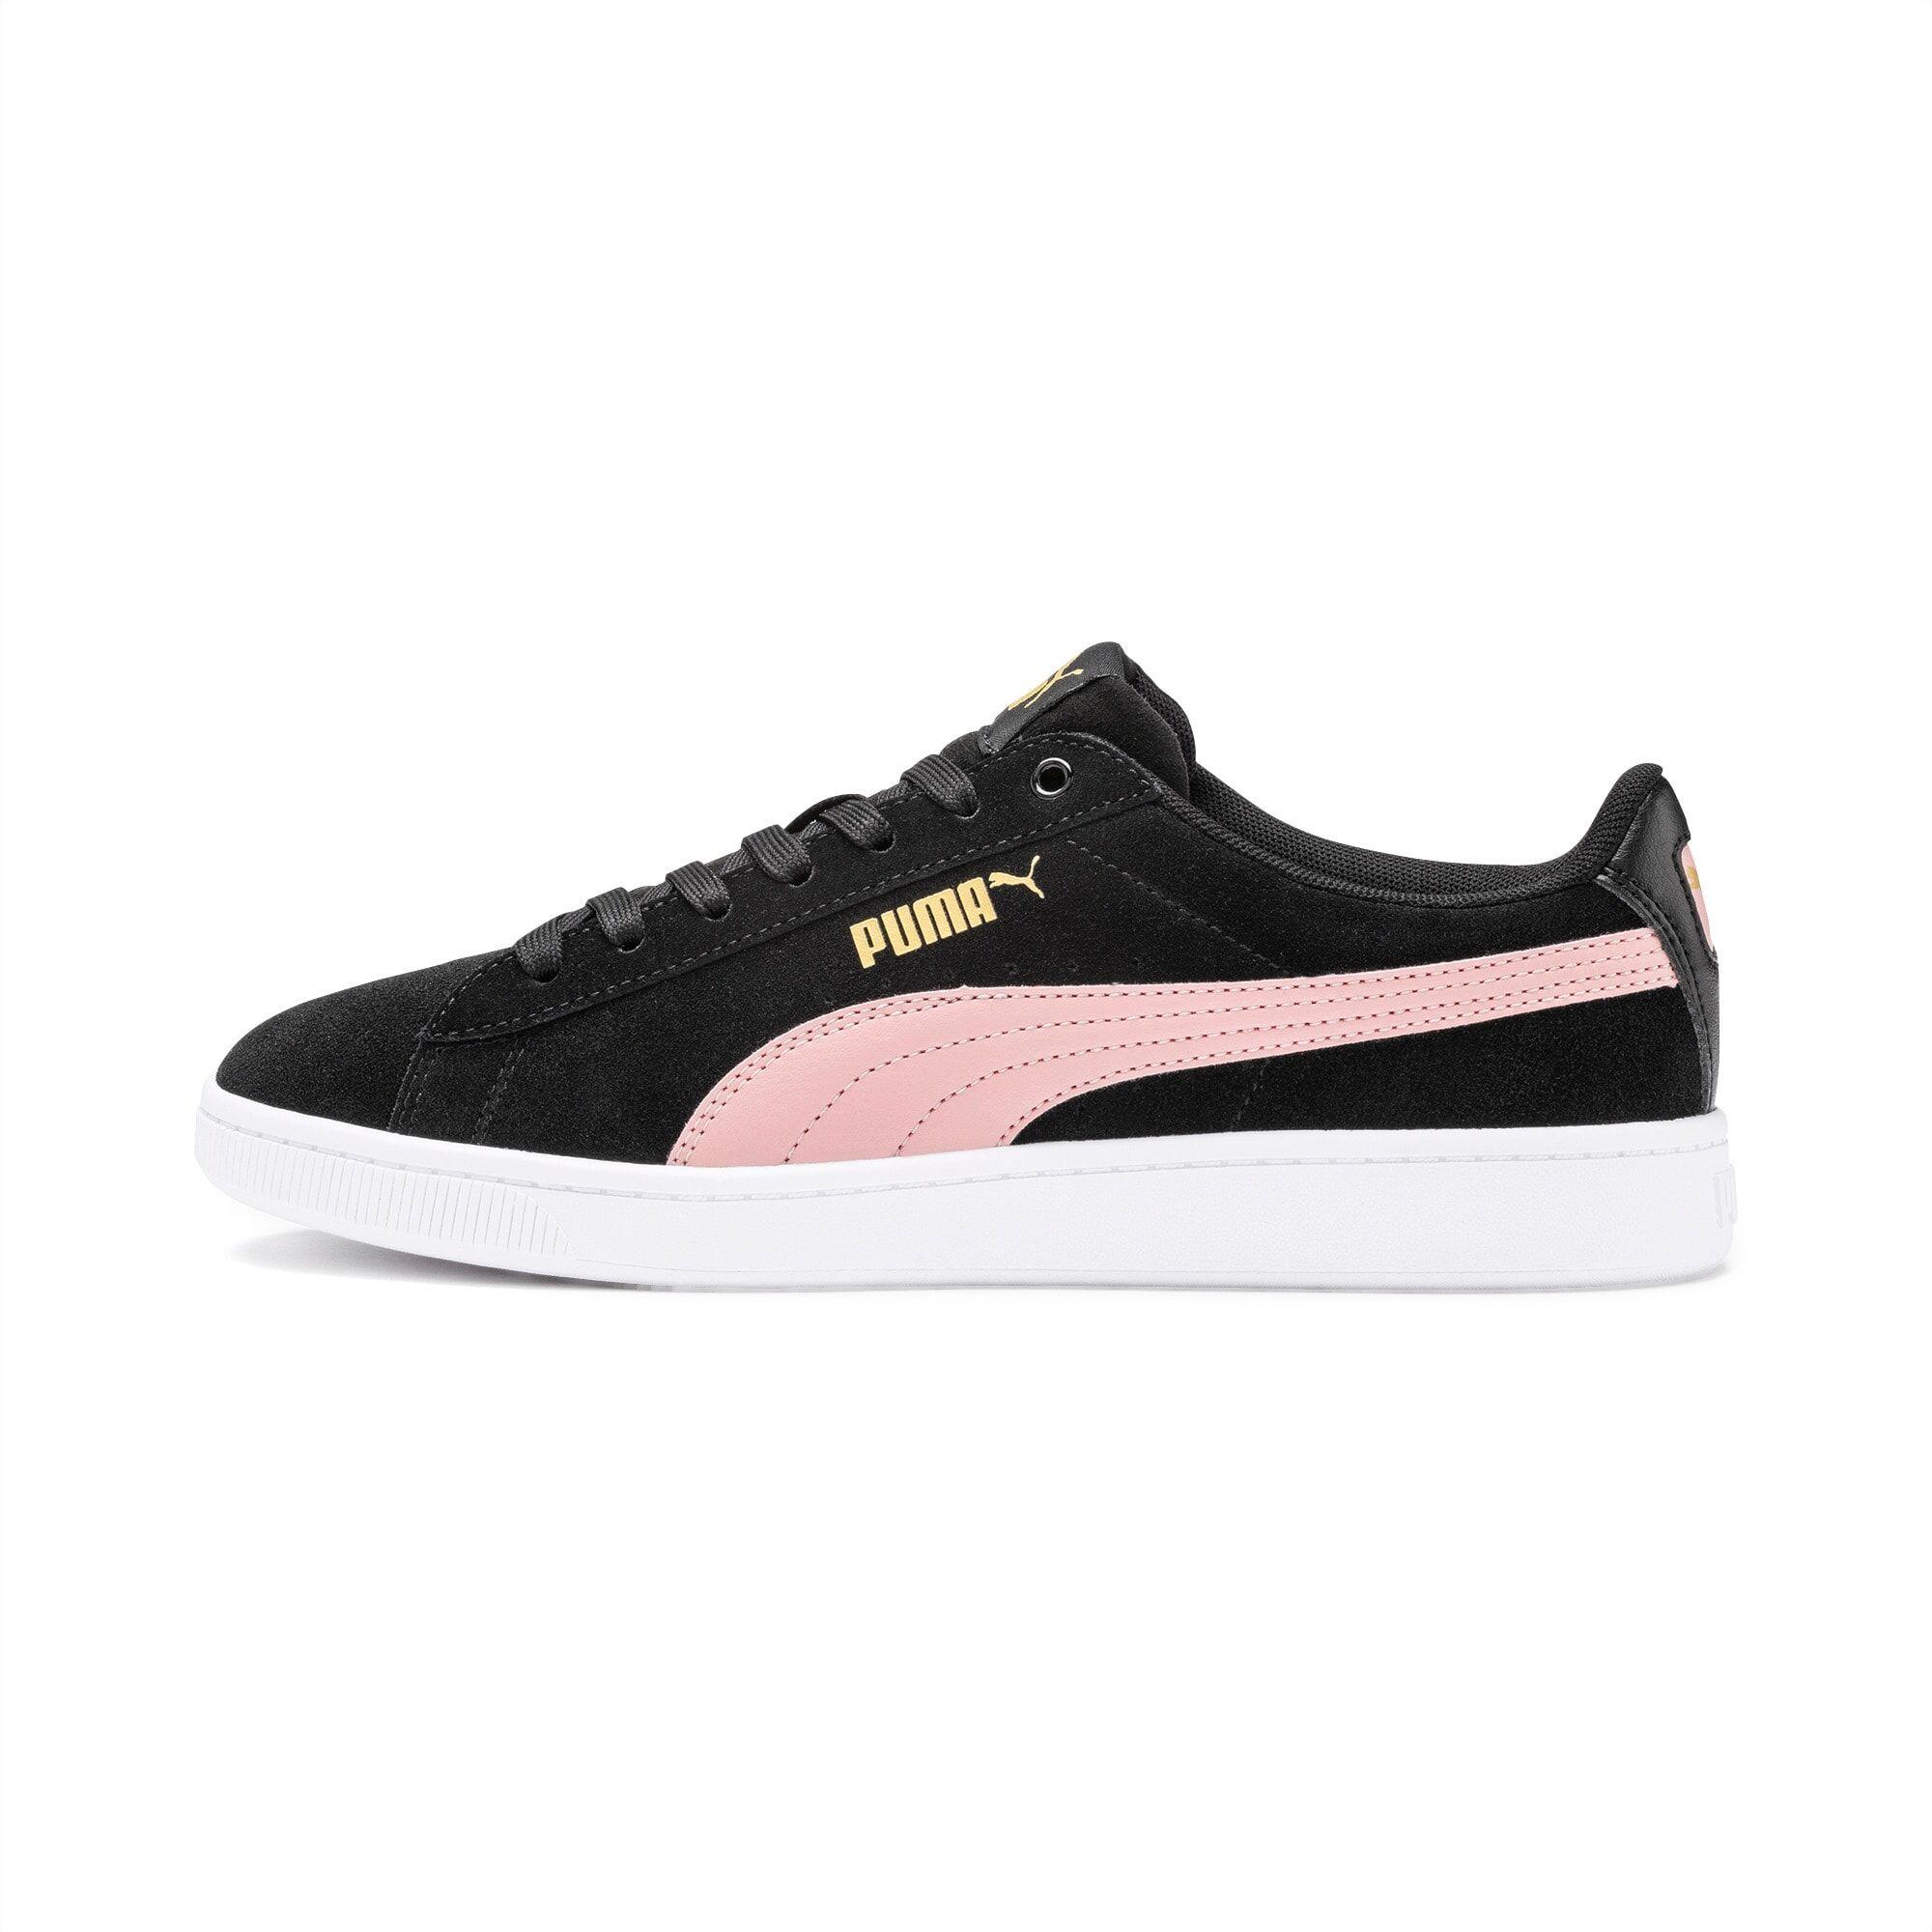 PUMA Chaussure Basket Vikky v2 pour Femme, Blanc/Rose/Noir, Taille 38.5, Chaussures